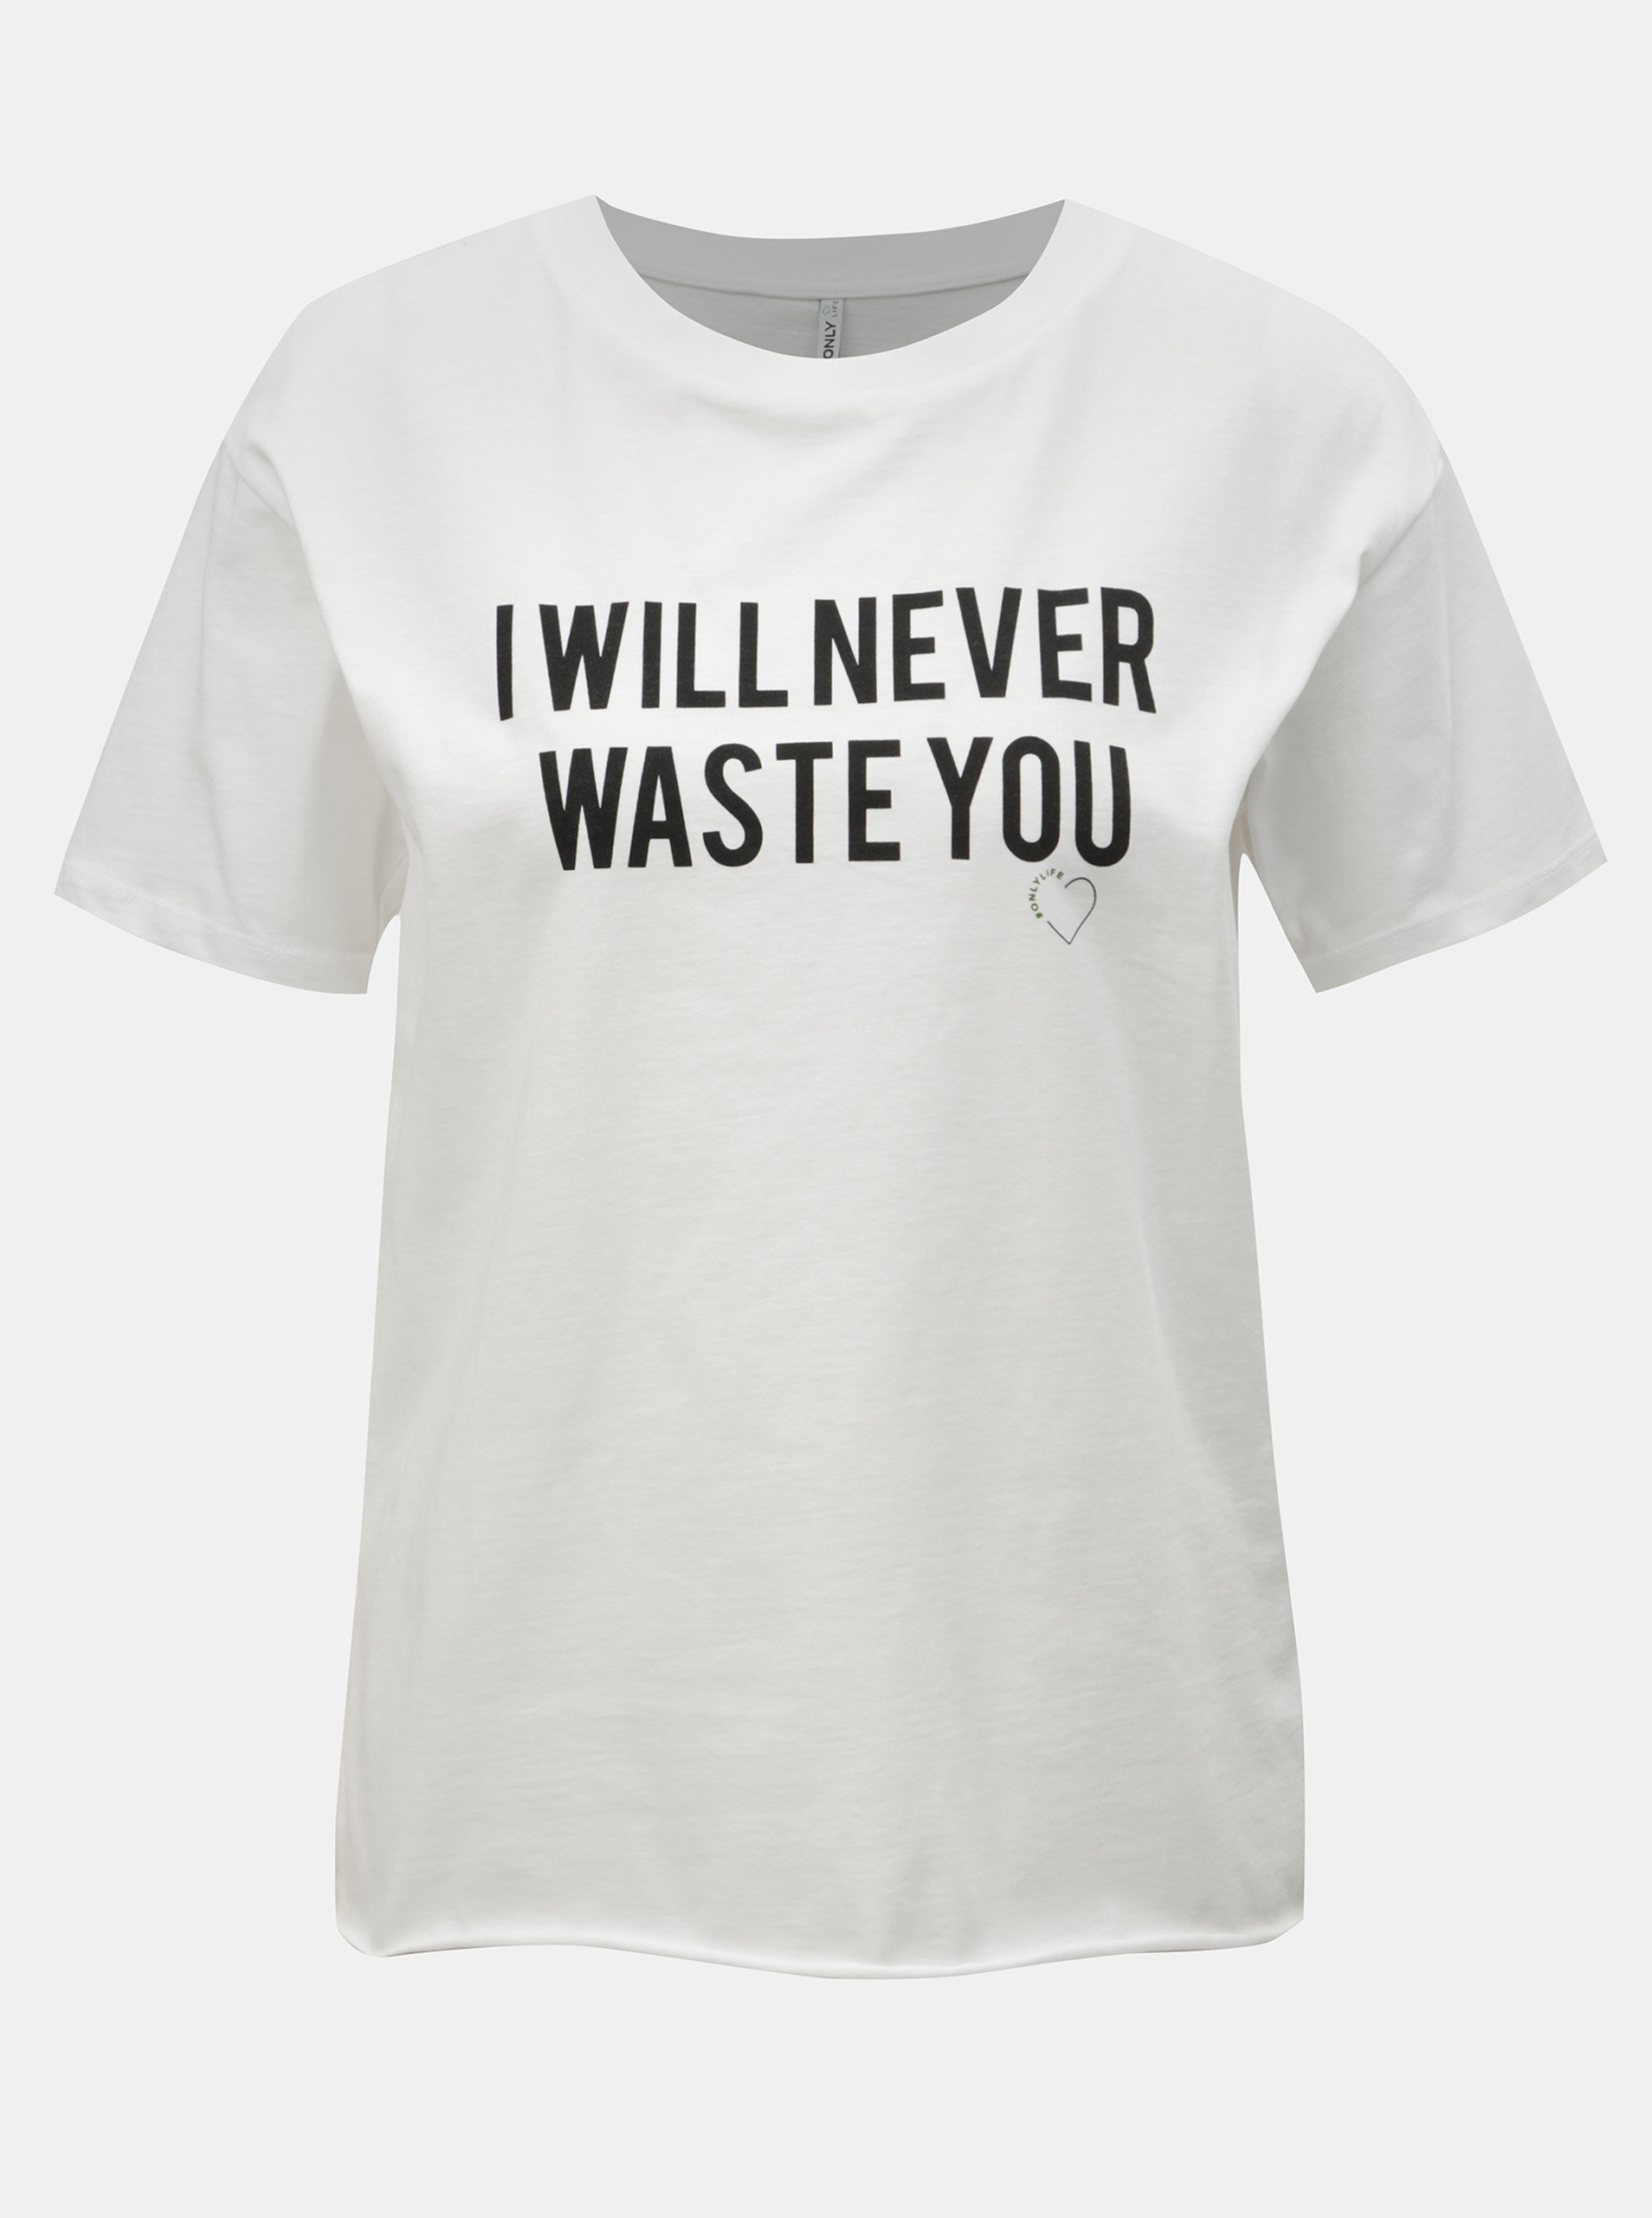 0f8211bfab8b9 Biele tričko s potlačou ONLY Heart | ZOOT.sk